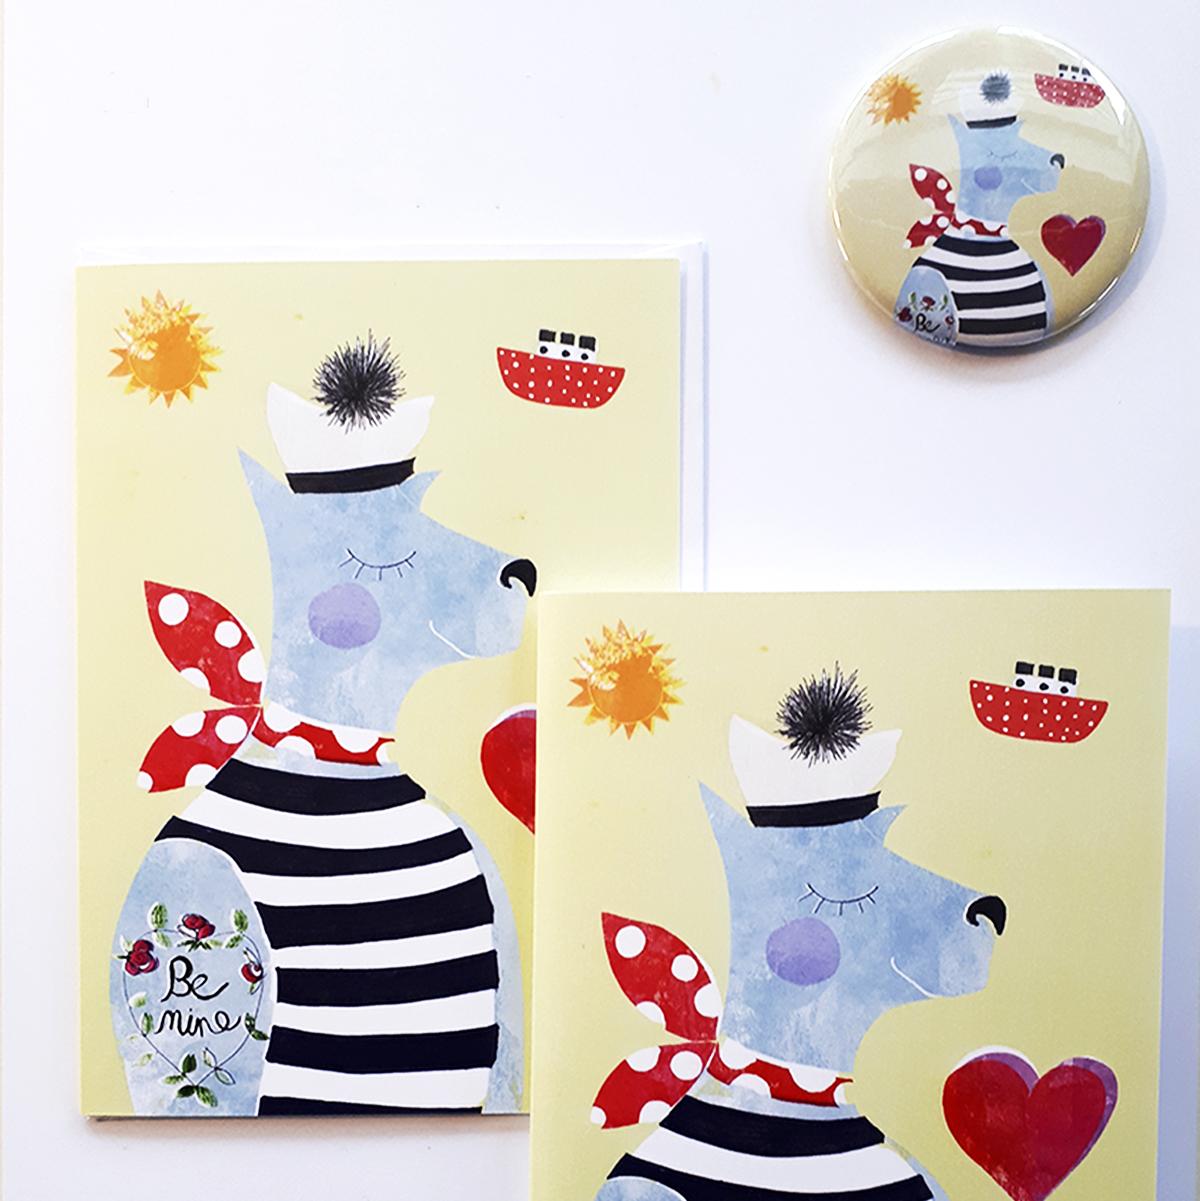 Packs valentines day_Be mine Susse.jpg